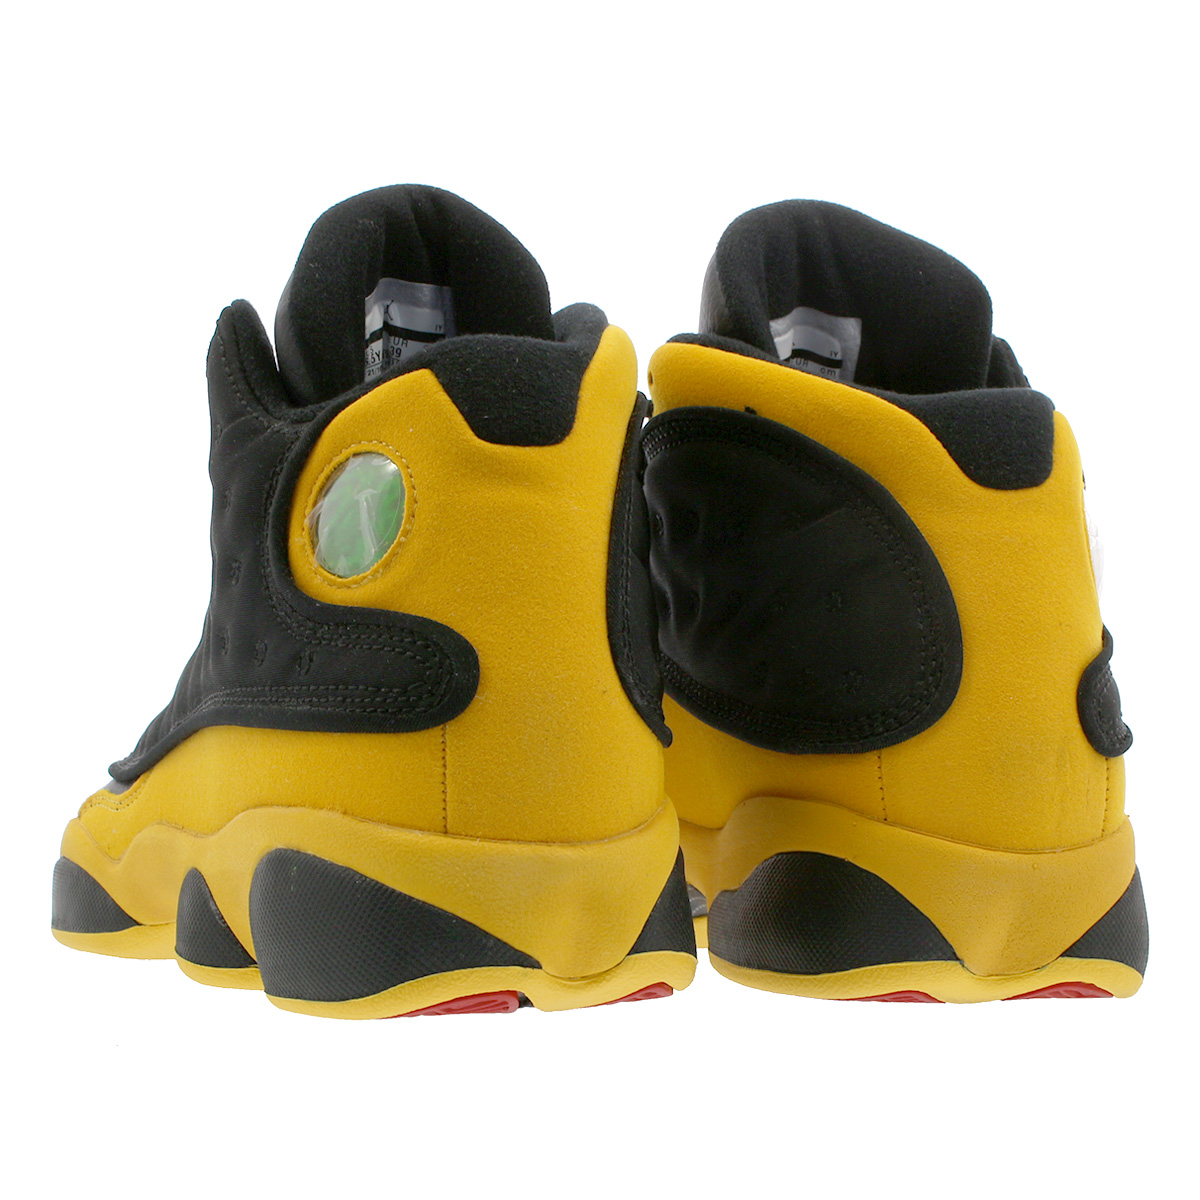 outlet store 84f98 323a3 NIKE AIR JORDAN 13 RETRO BG Nike Air Jordan 13 nostalgic BG  BLACK/UNIVERSITY RED/UNIVERSITY GOLD 884,129-035